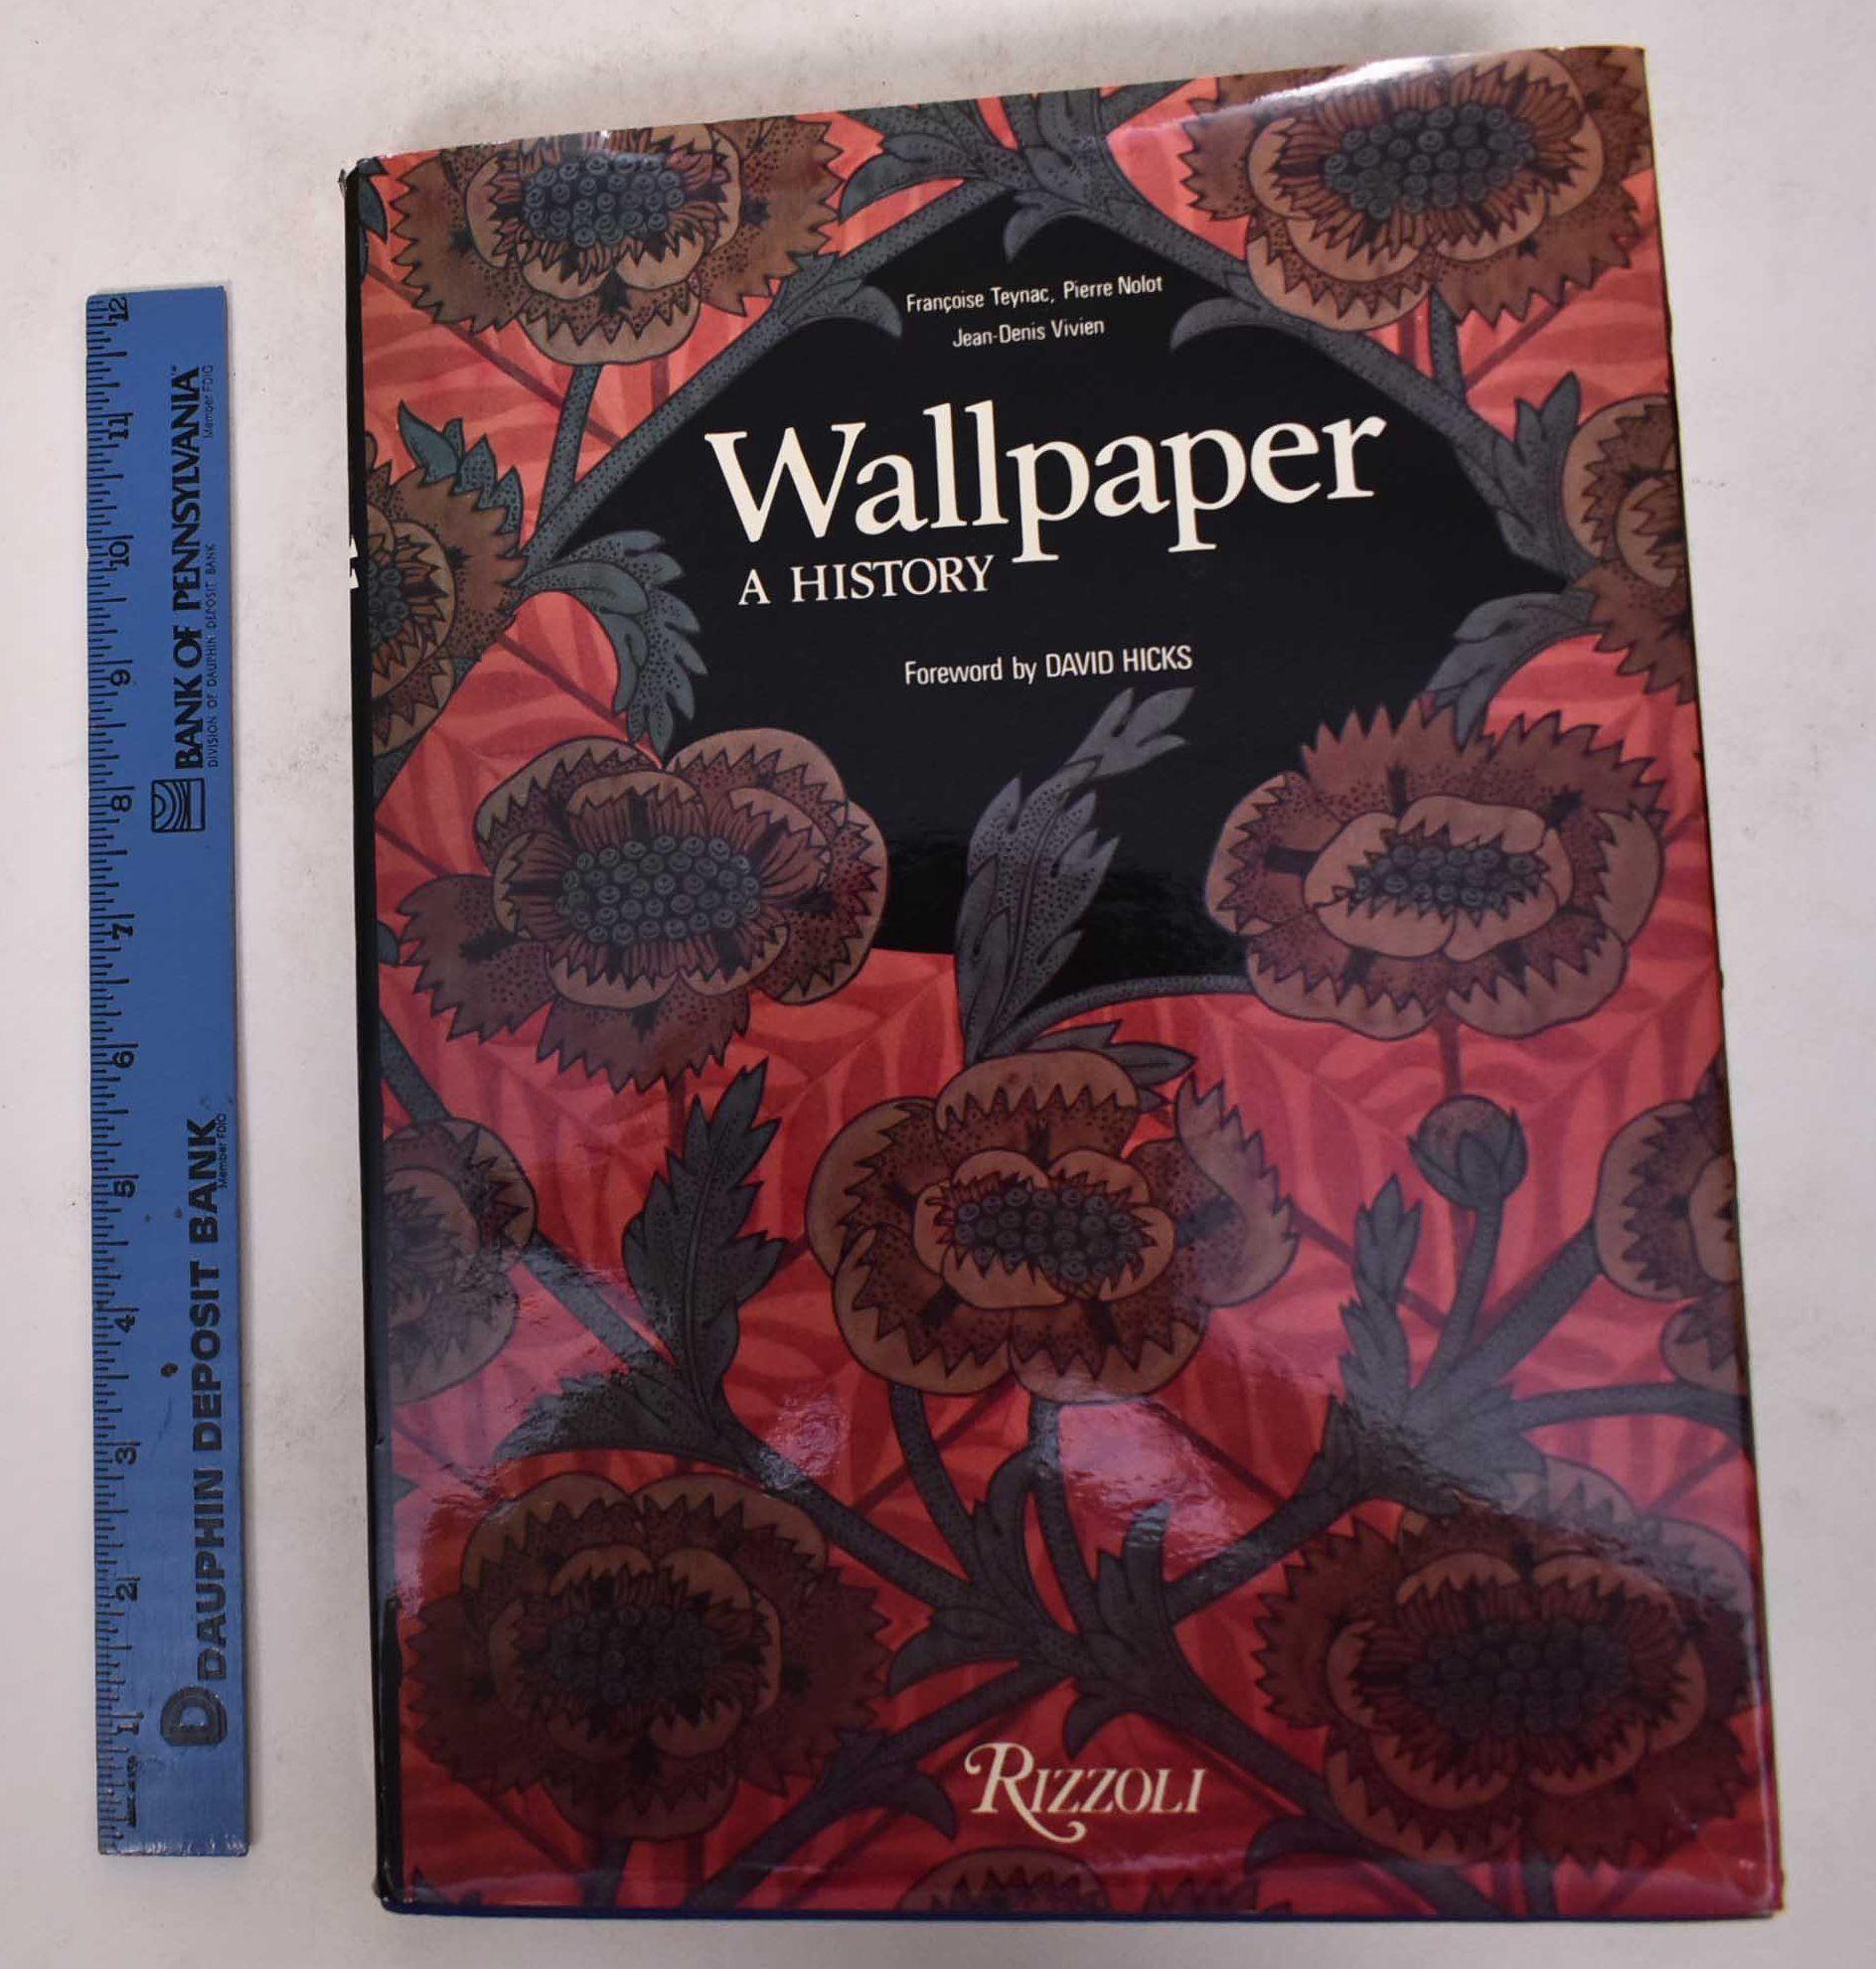 Papier Peint David Hicks 9780847804344 - wallpaper, a historyfrancoise teynac